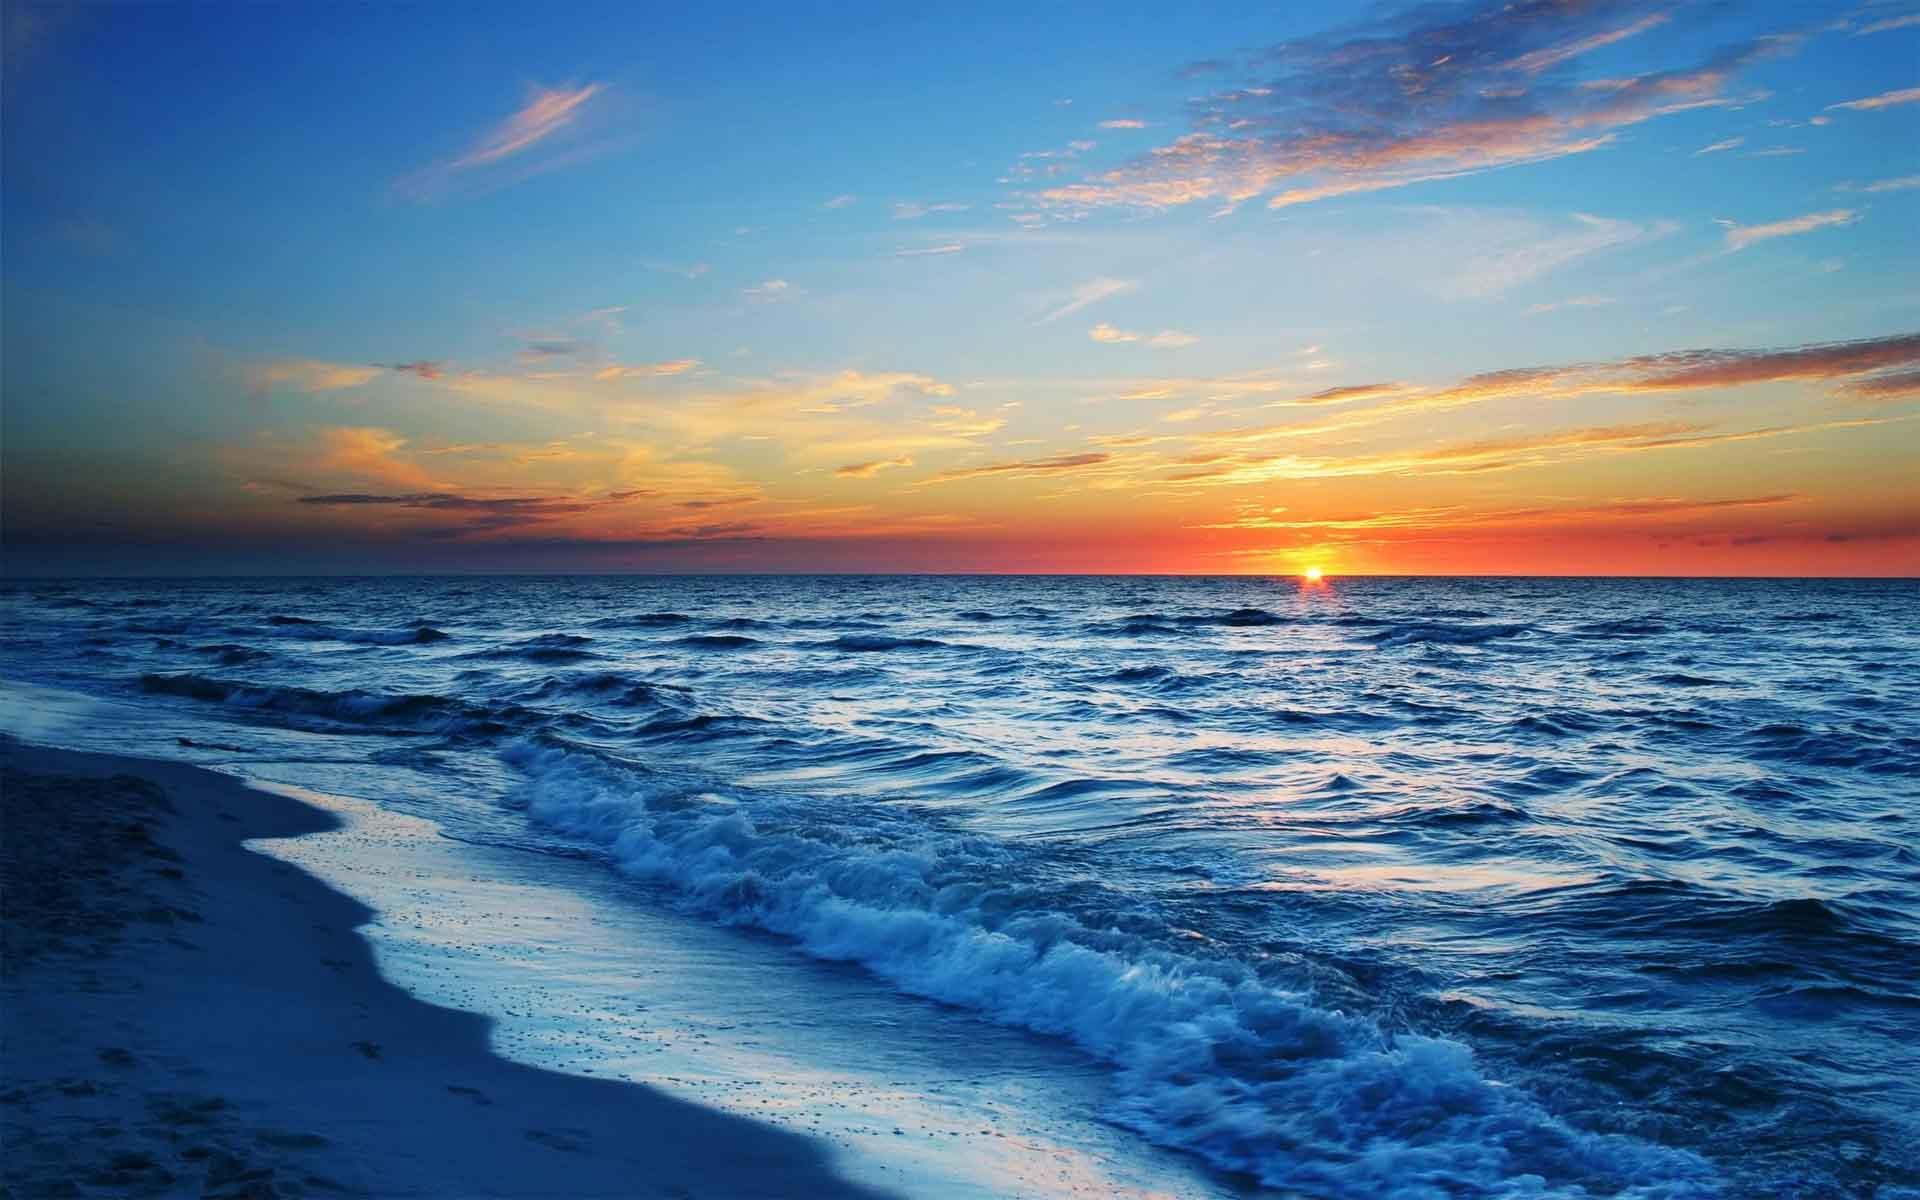 Beautiful-Sea-View-HD-Wallpapers-free-Download-21.jpg